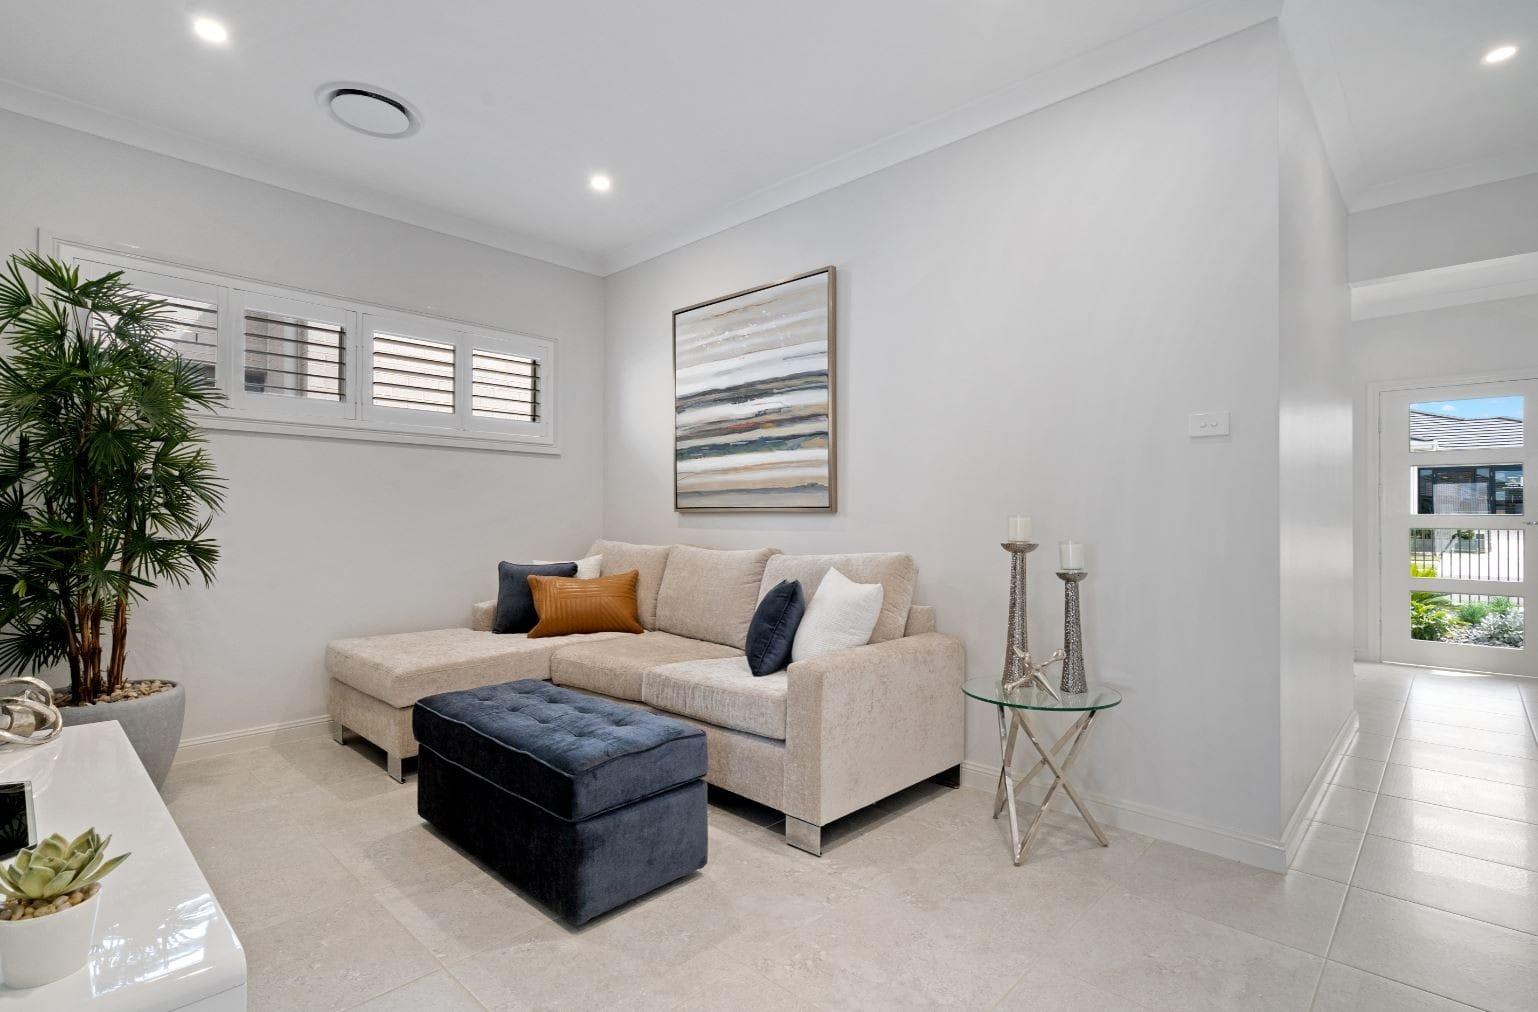 Property Lot 252 Oaklawn St -  Futurity Rise Estate, Box Hill NSW 2765 secondary IMAGE